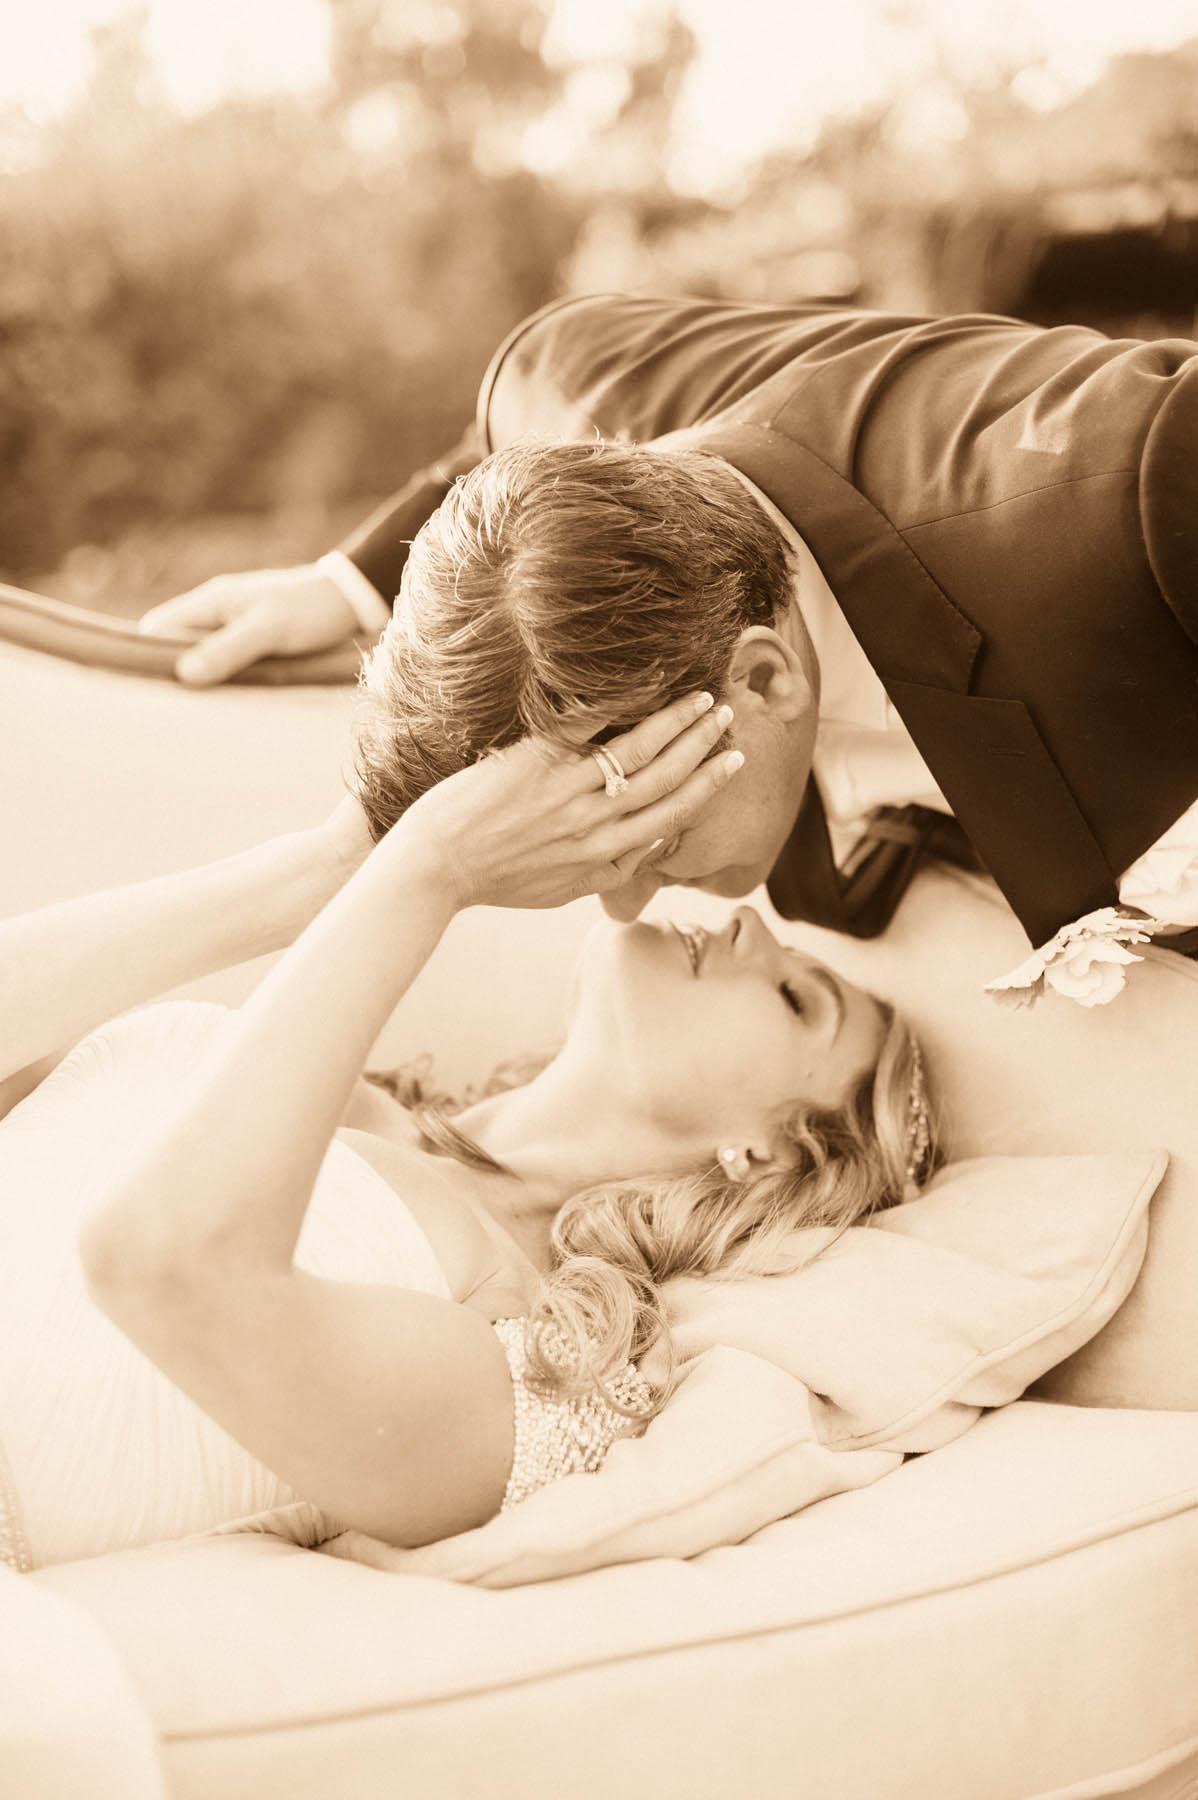 Santa Barbara Weddign Style | Megan Sorel | Bride and Groom Kissing